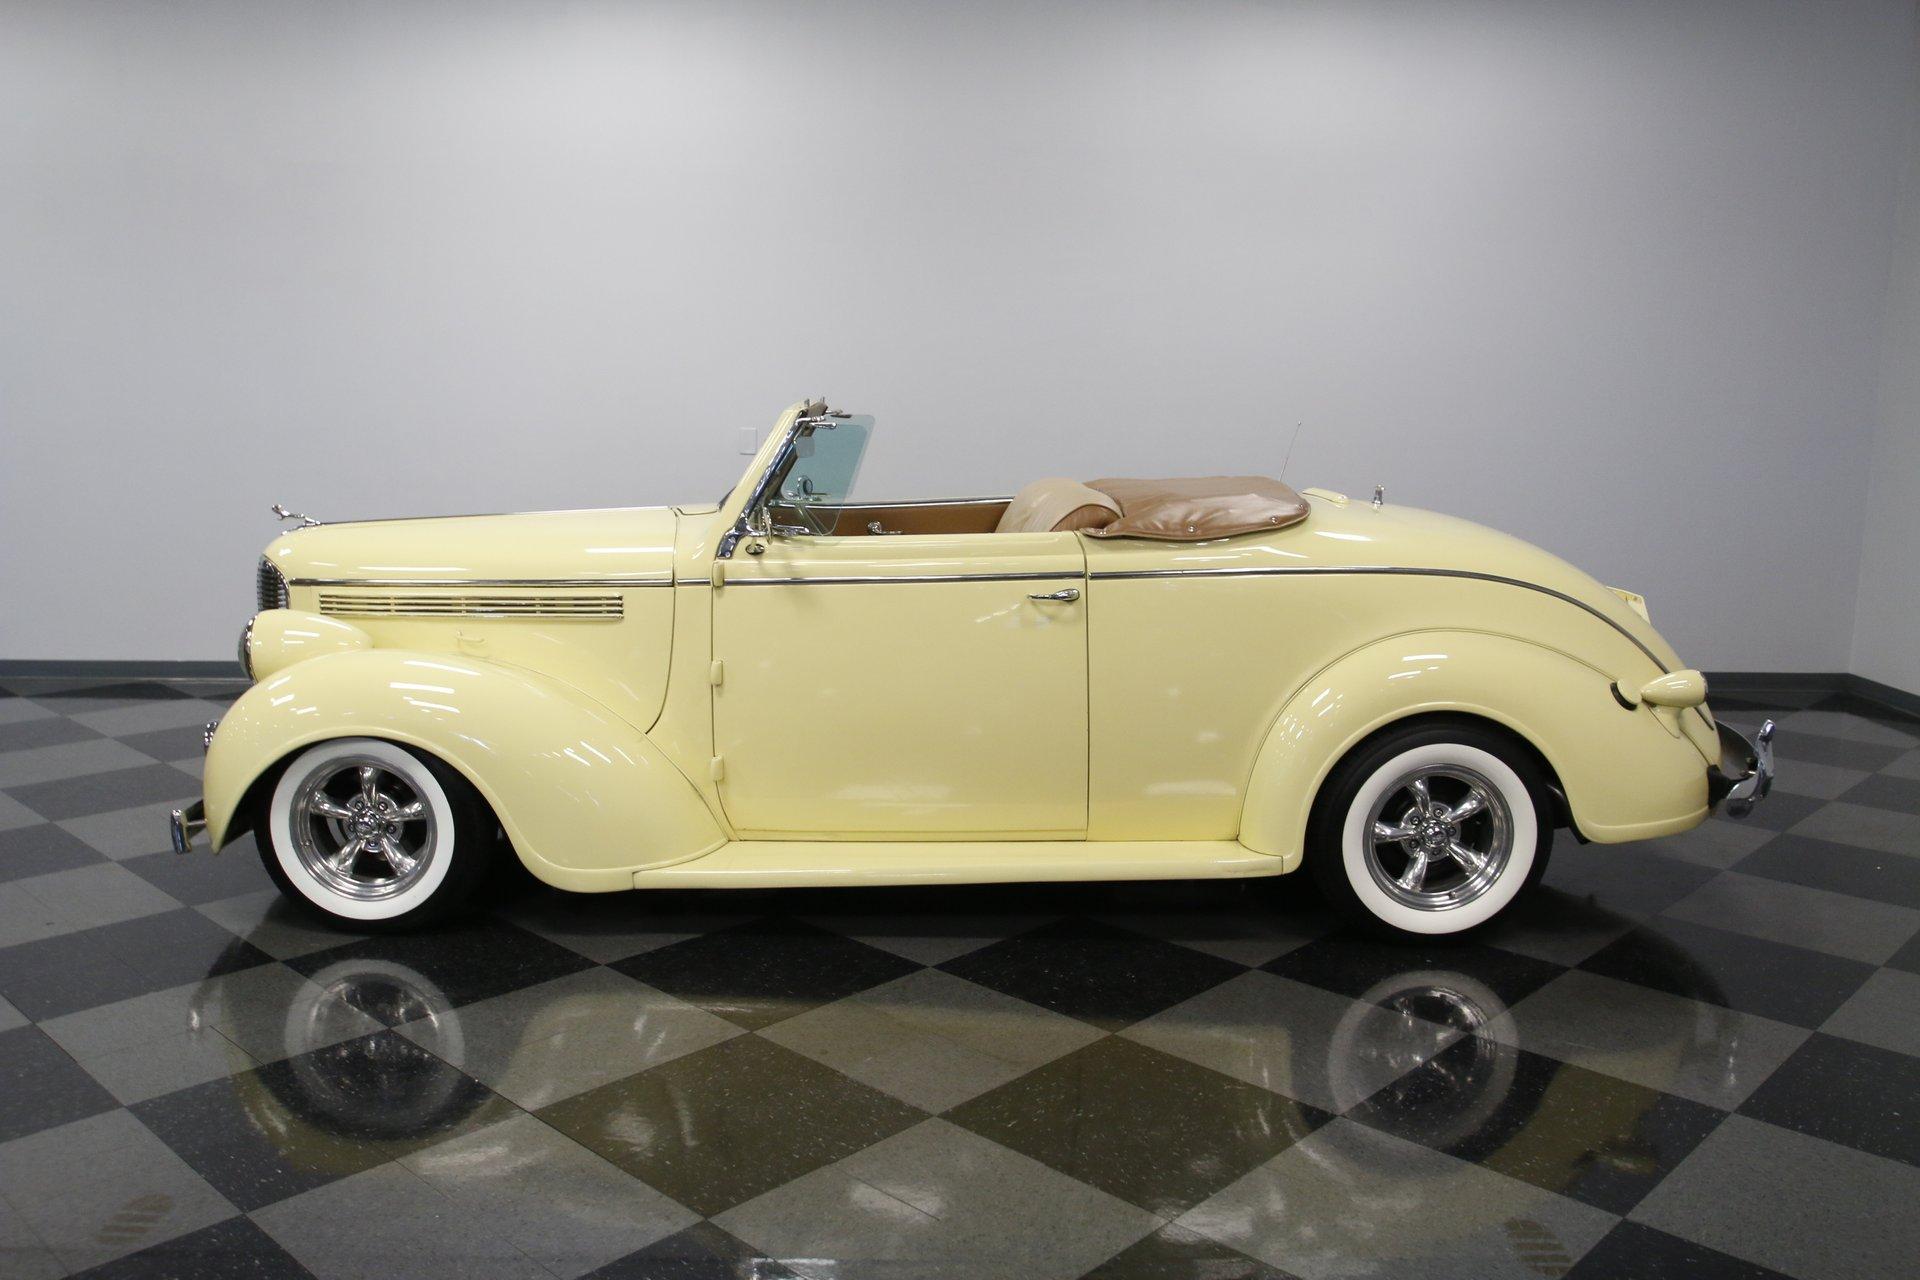 1938 dodge d8 convertible coupe